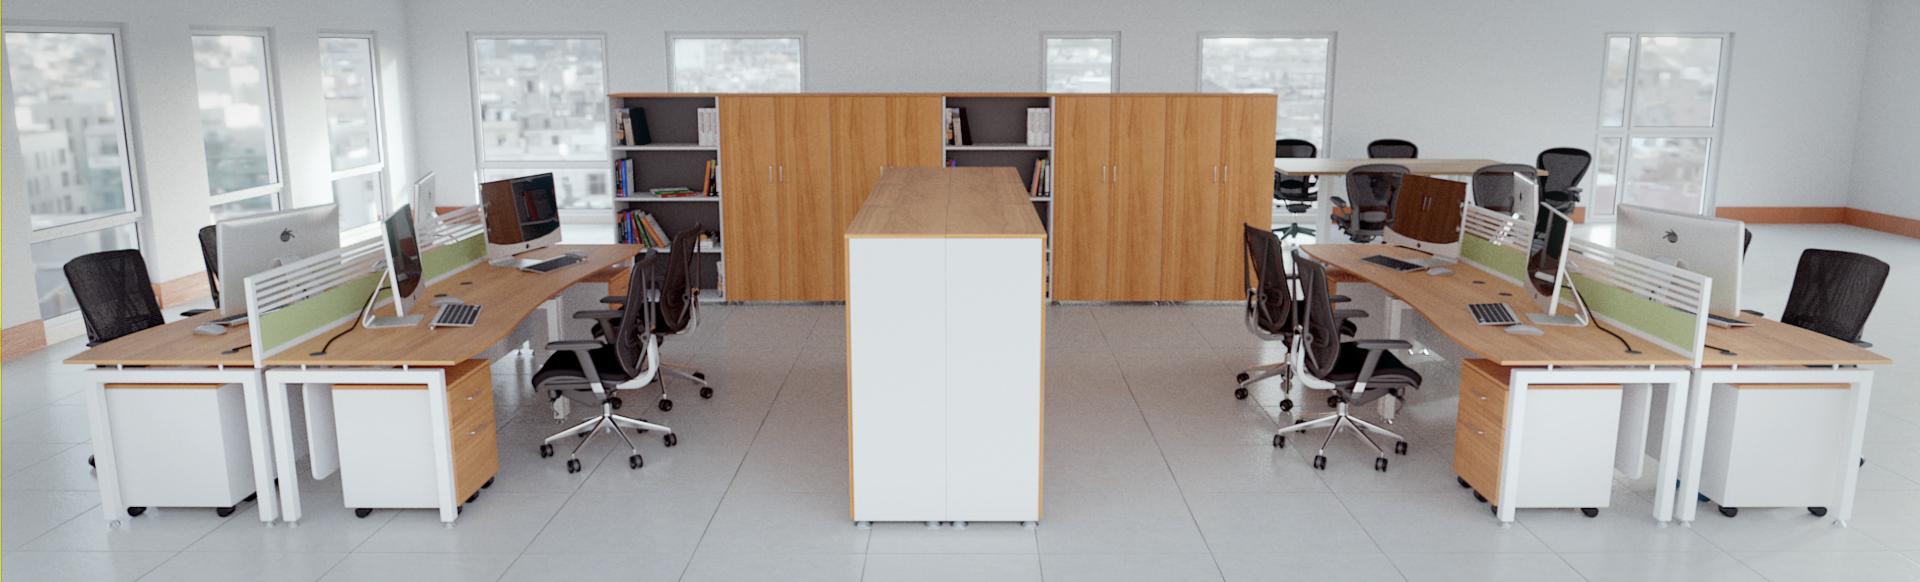 NOVA OFFICE WORKSTATIONS